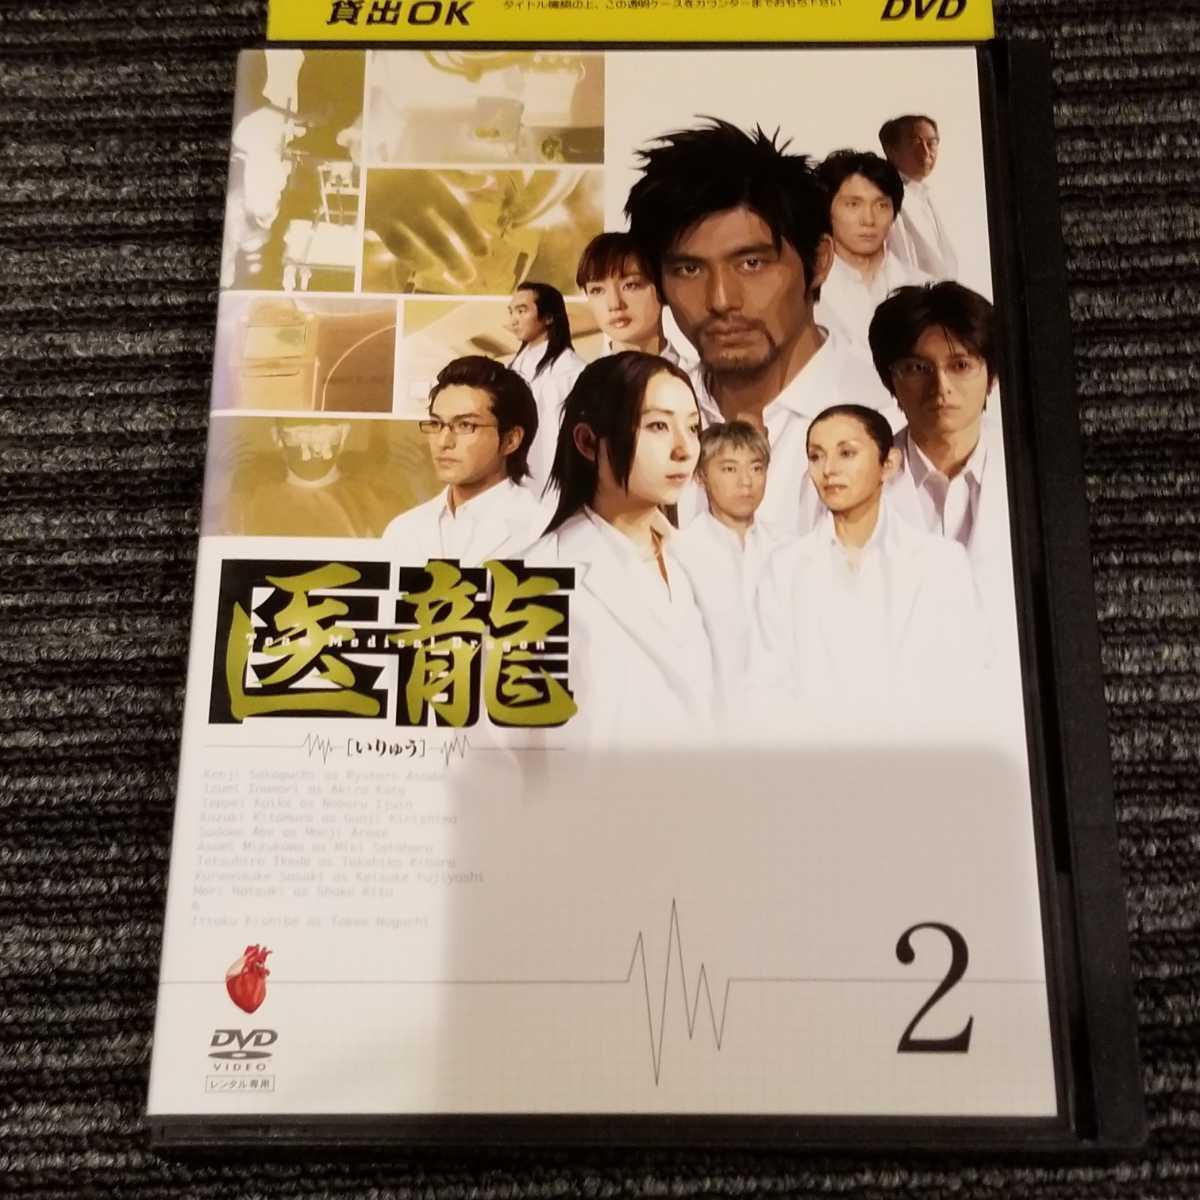 DVDソフト 医龍 2巻 中古品